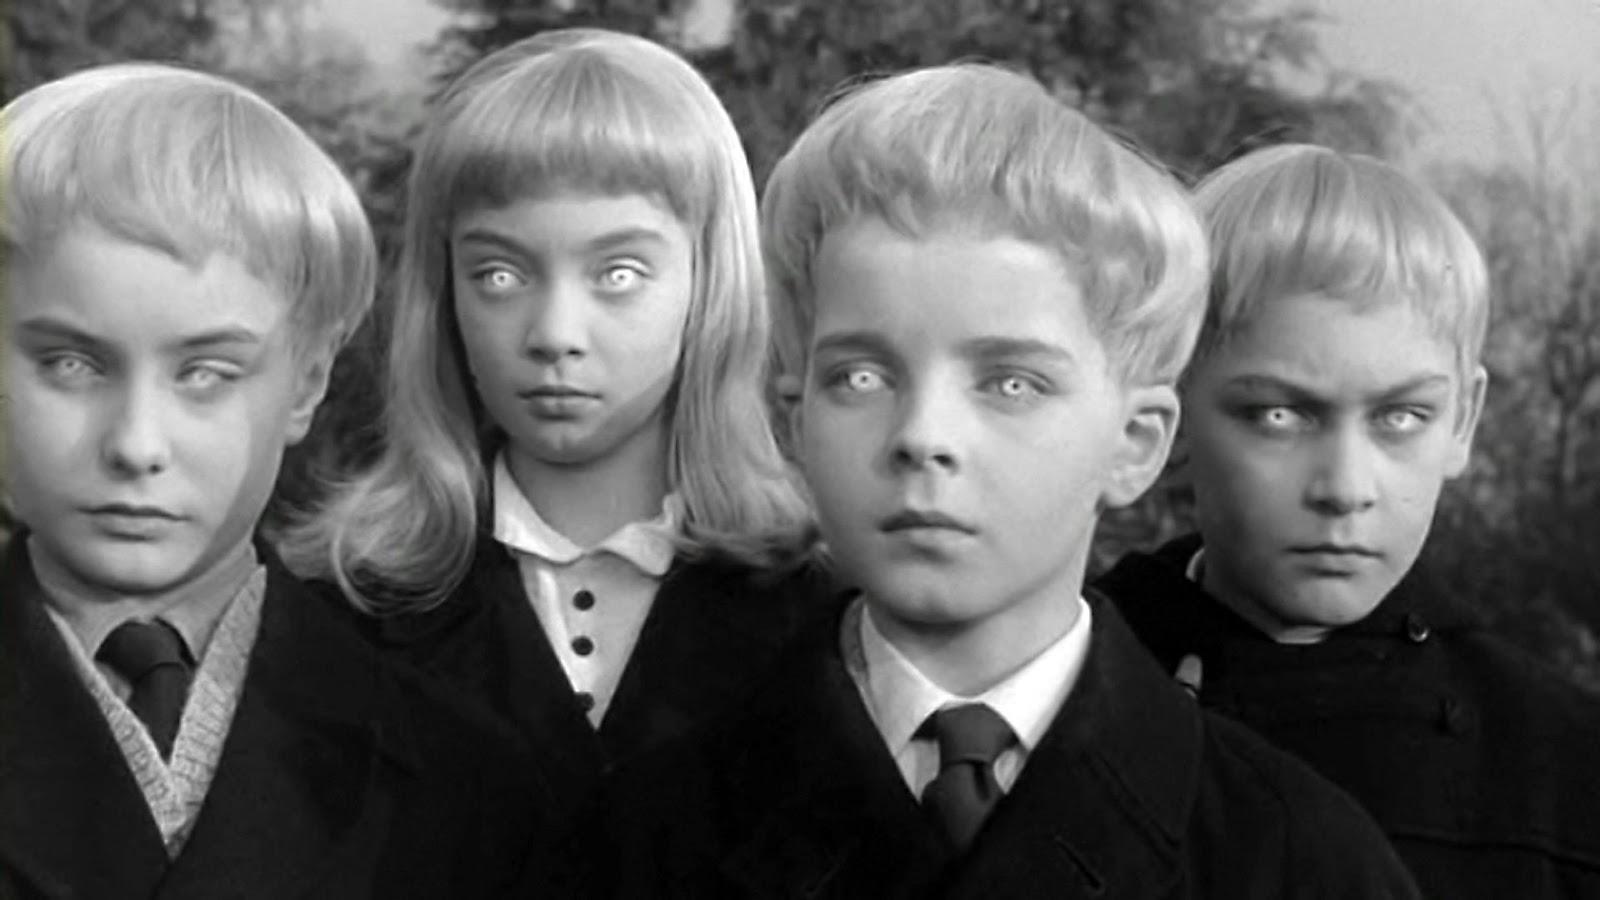 Too Scary 2 Watch Best 60 S Horror Films